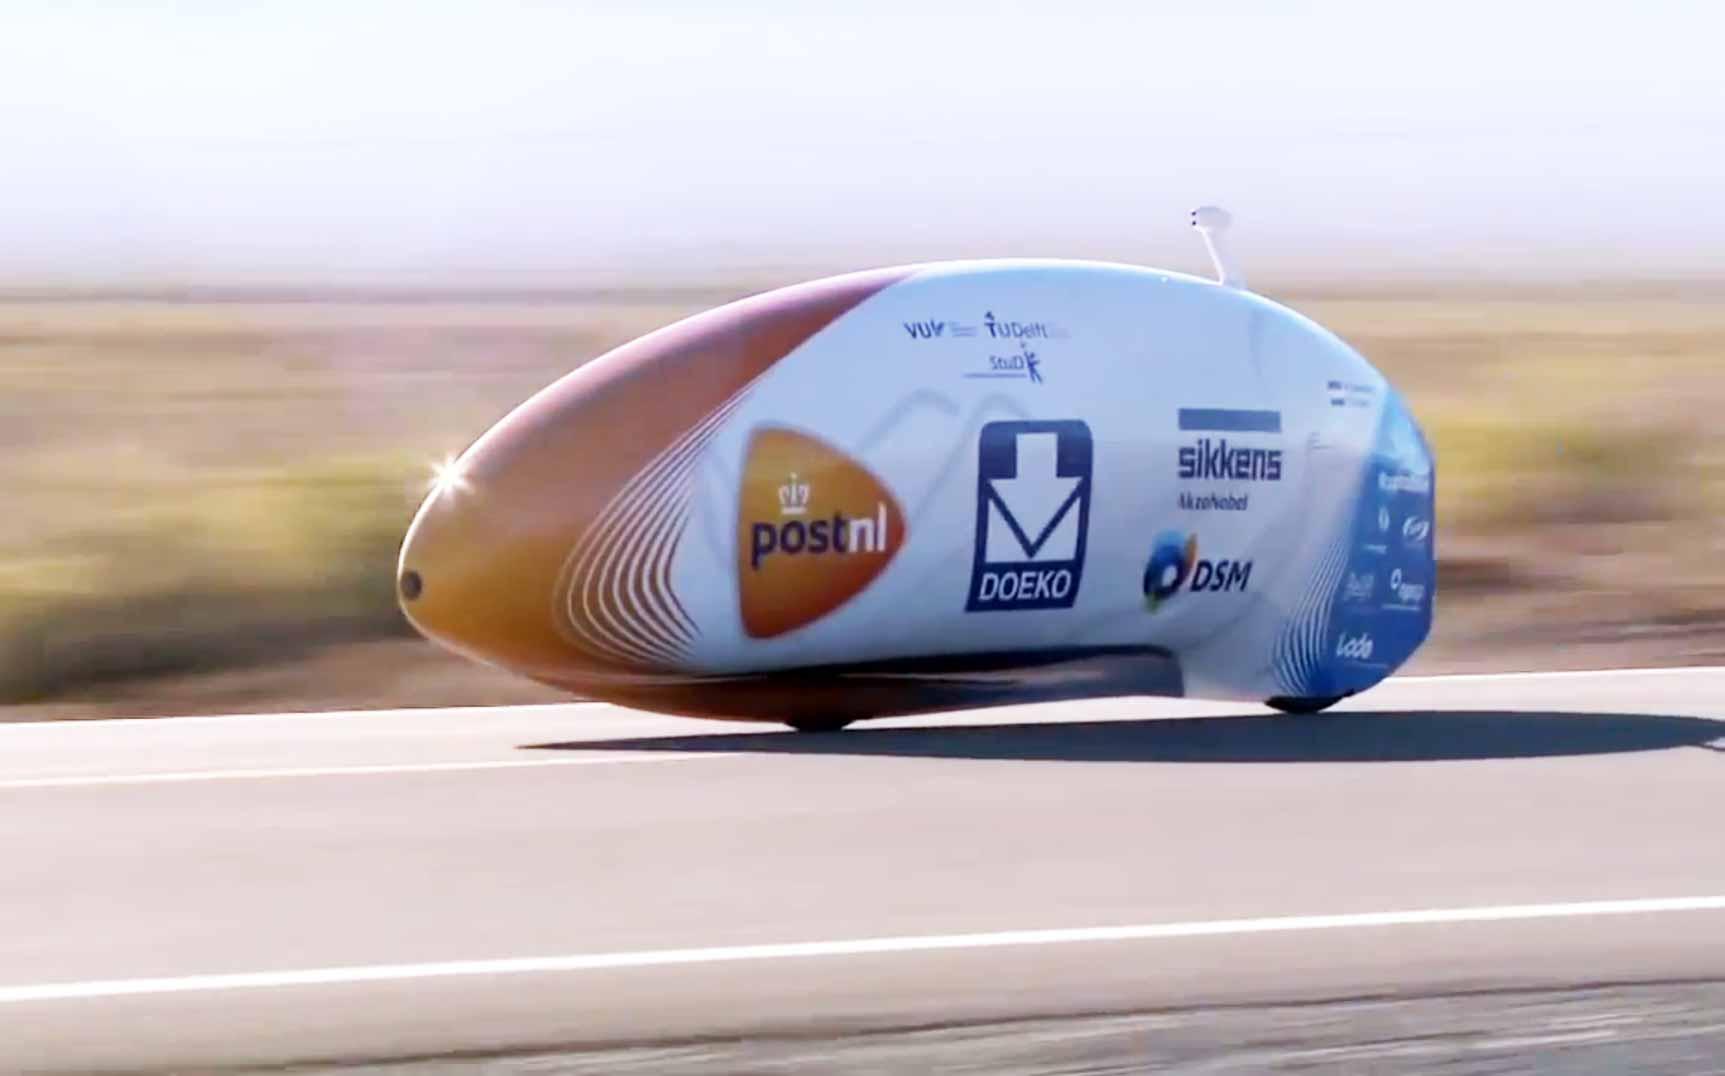 bicycle-world-speed-record-image10.jpg